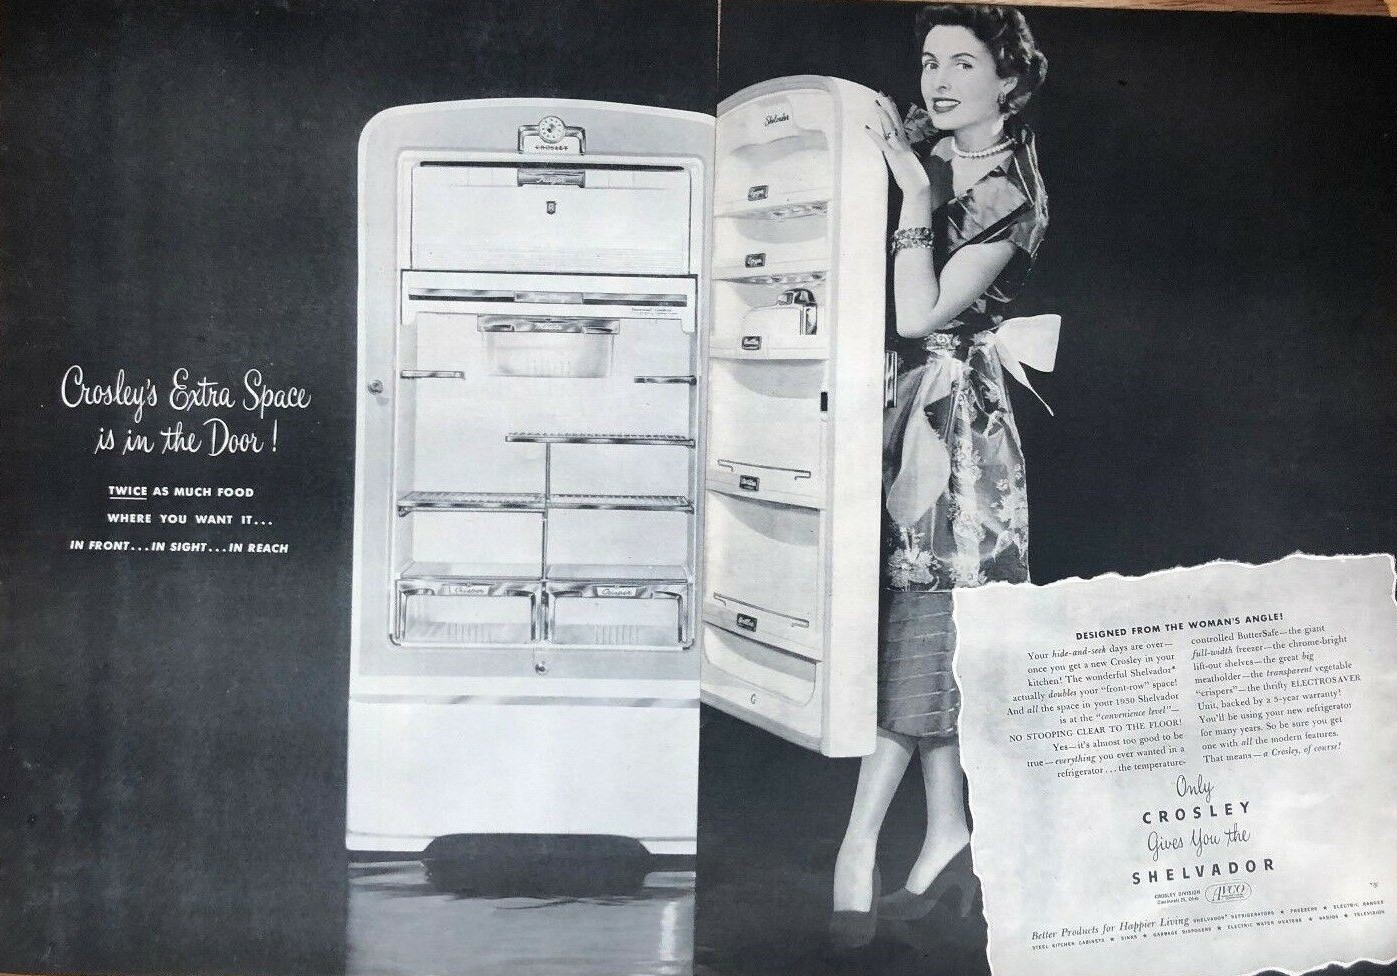 1950 CROSSLEY Refrigerator